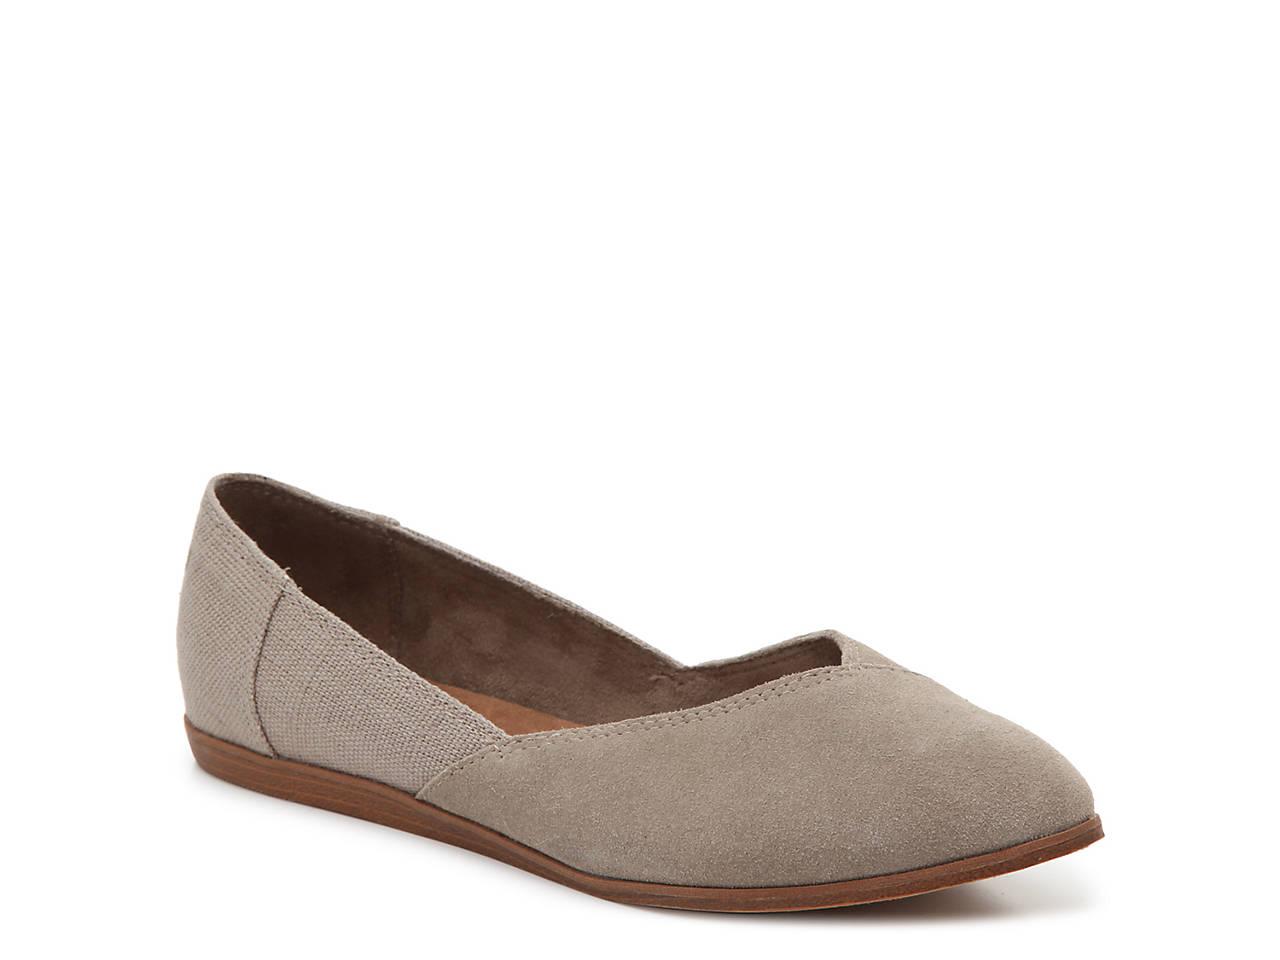 b4853233d TOMS Jutti Flat Women's Shoes | DSW